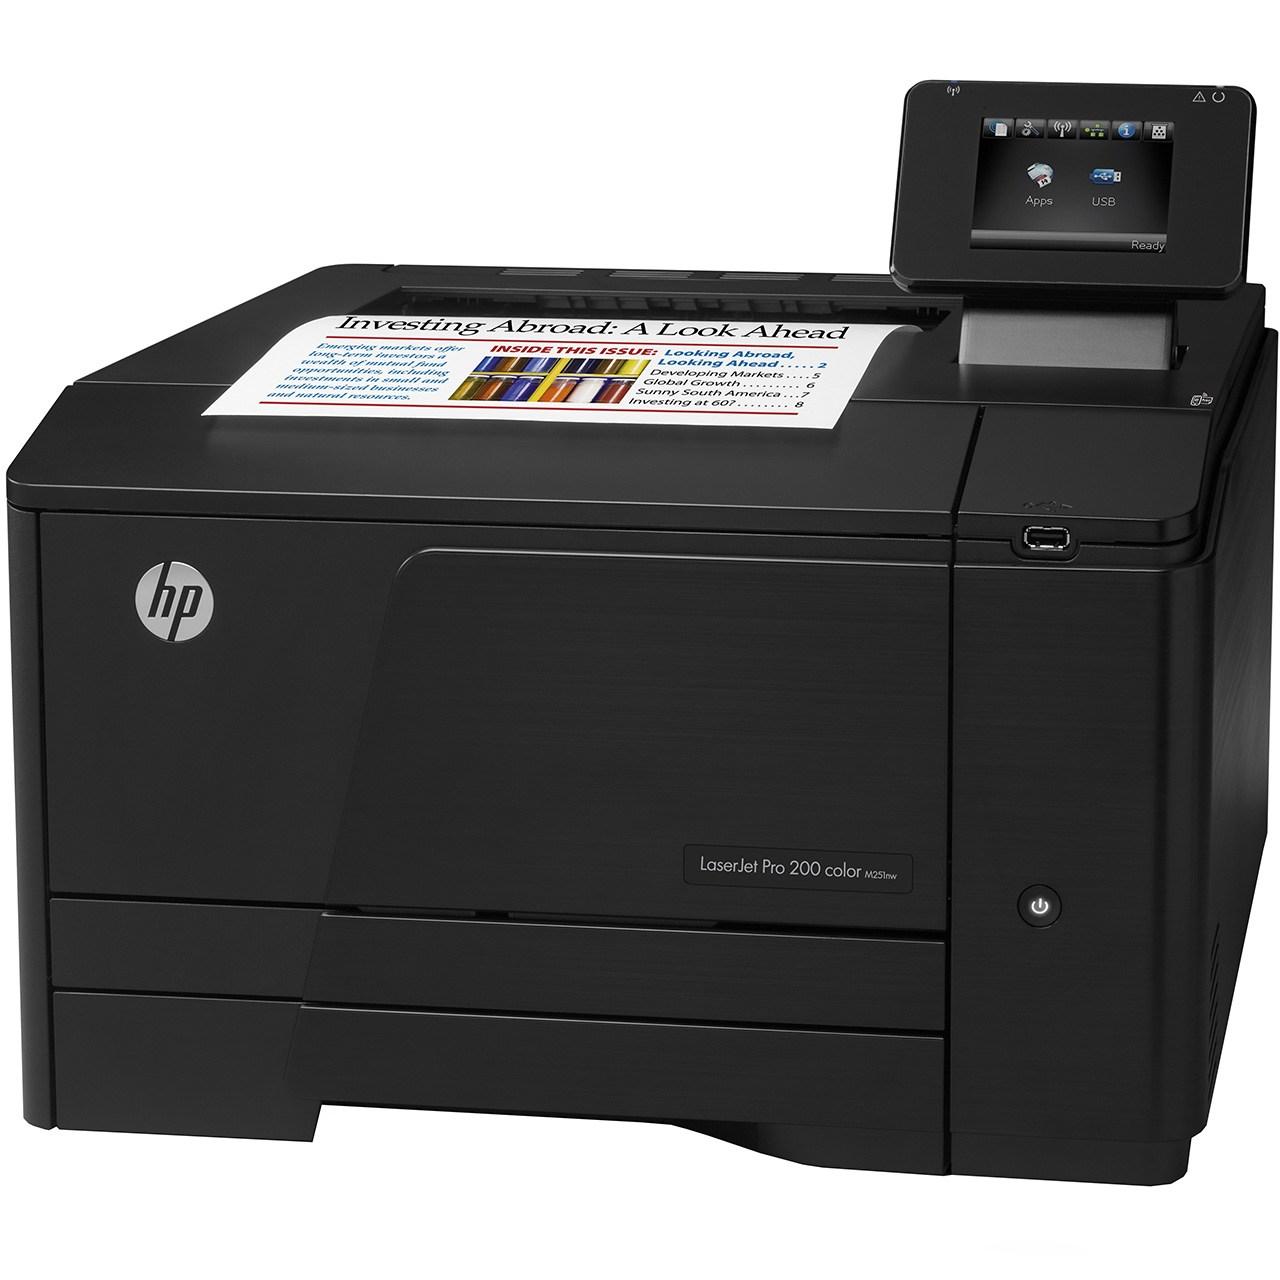 خرید پرینتر رنگی لیزری اچ پی مدل LaserJet Pro 200 M251nw